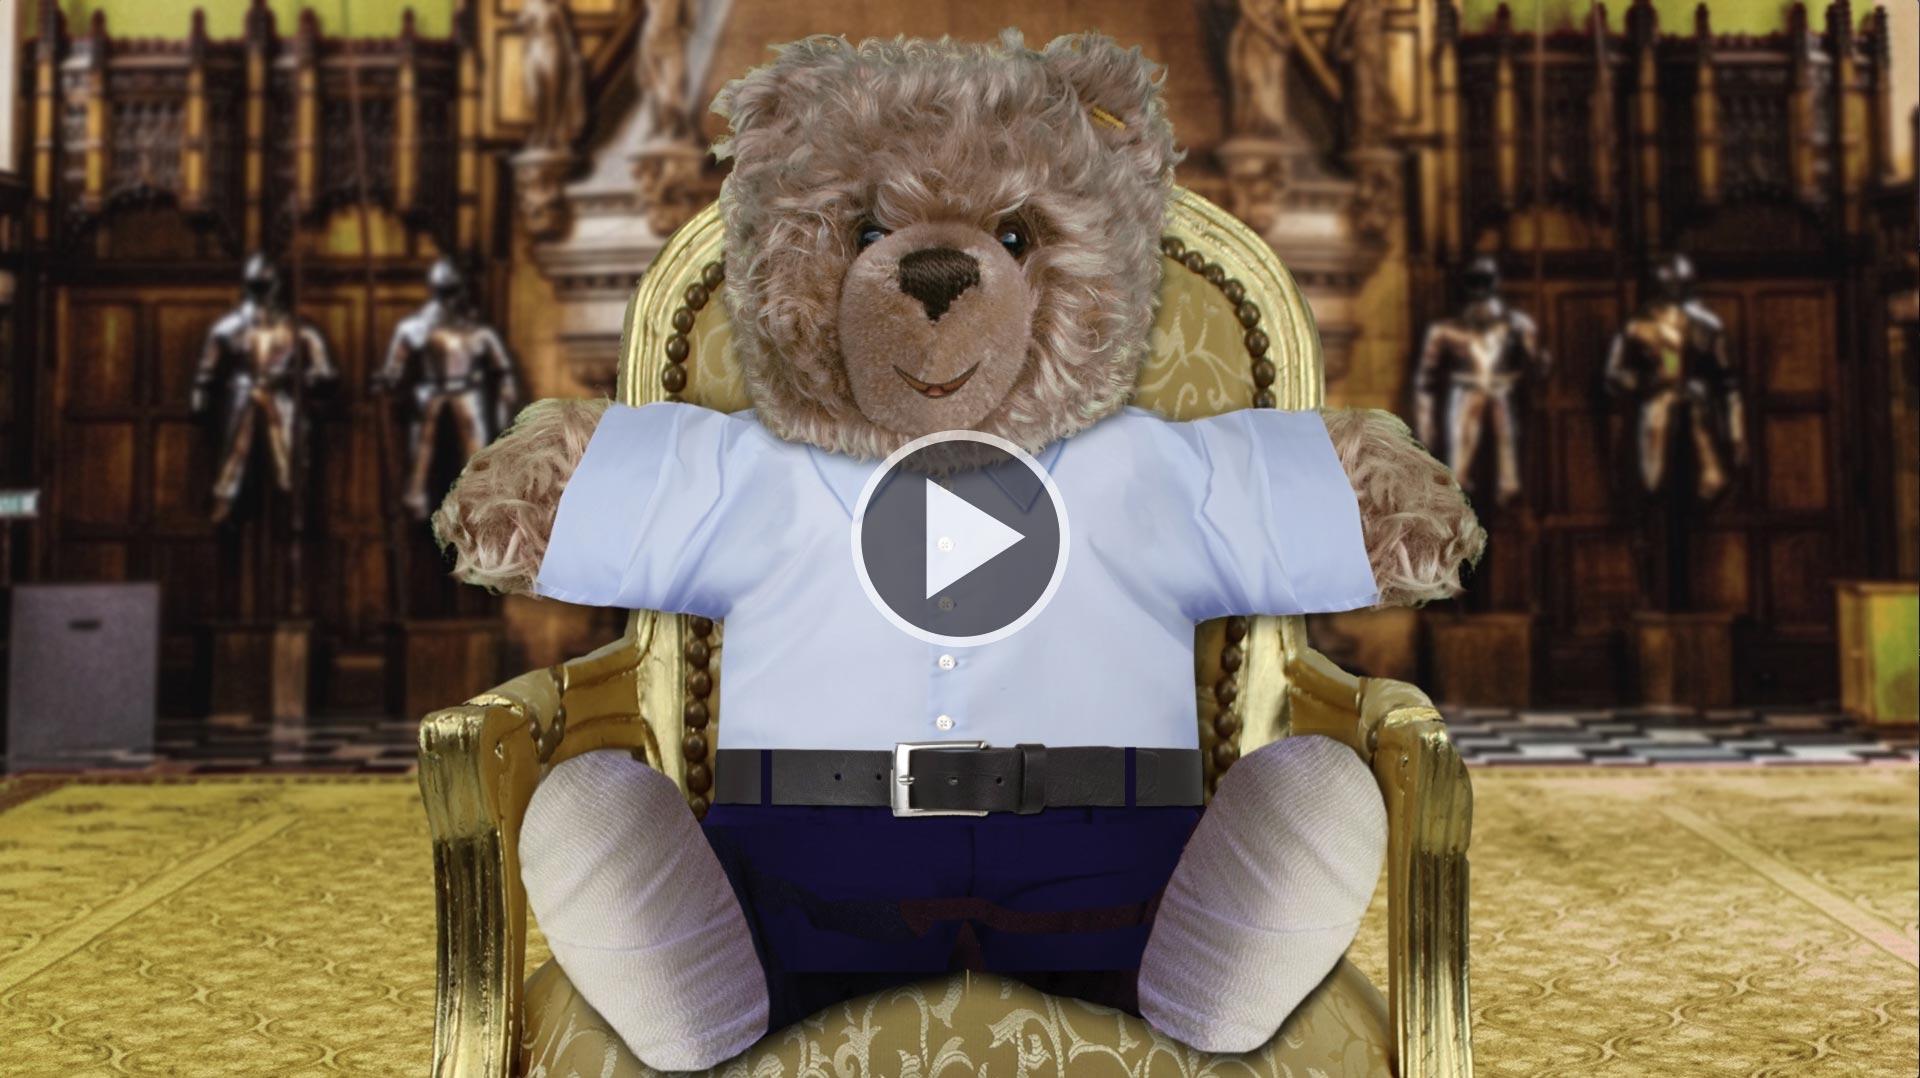 Teddy-König Opa I. und das Motivationstraining